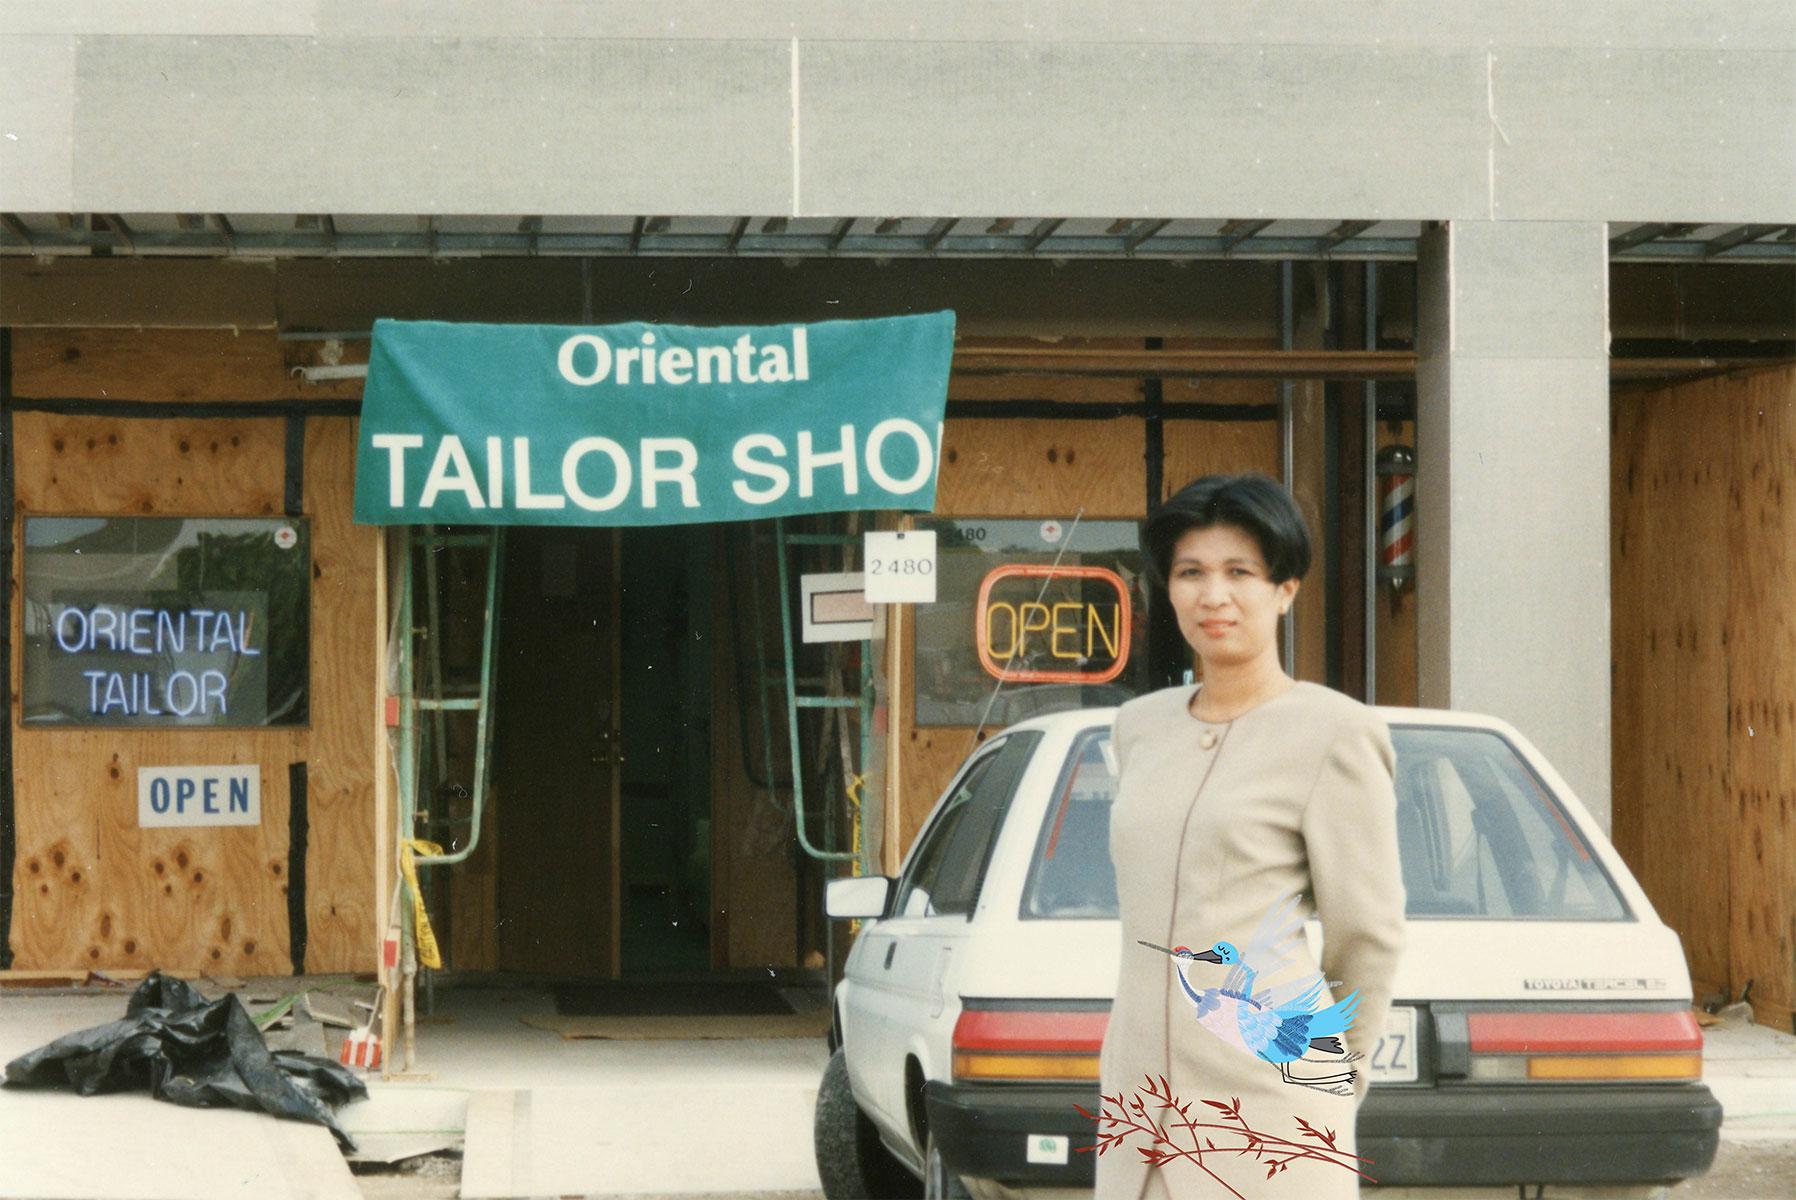 oriental-tailor-shop_embroidered-dragon_x1200_190113_nh_v1.1.0_lr.jpg